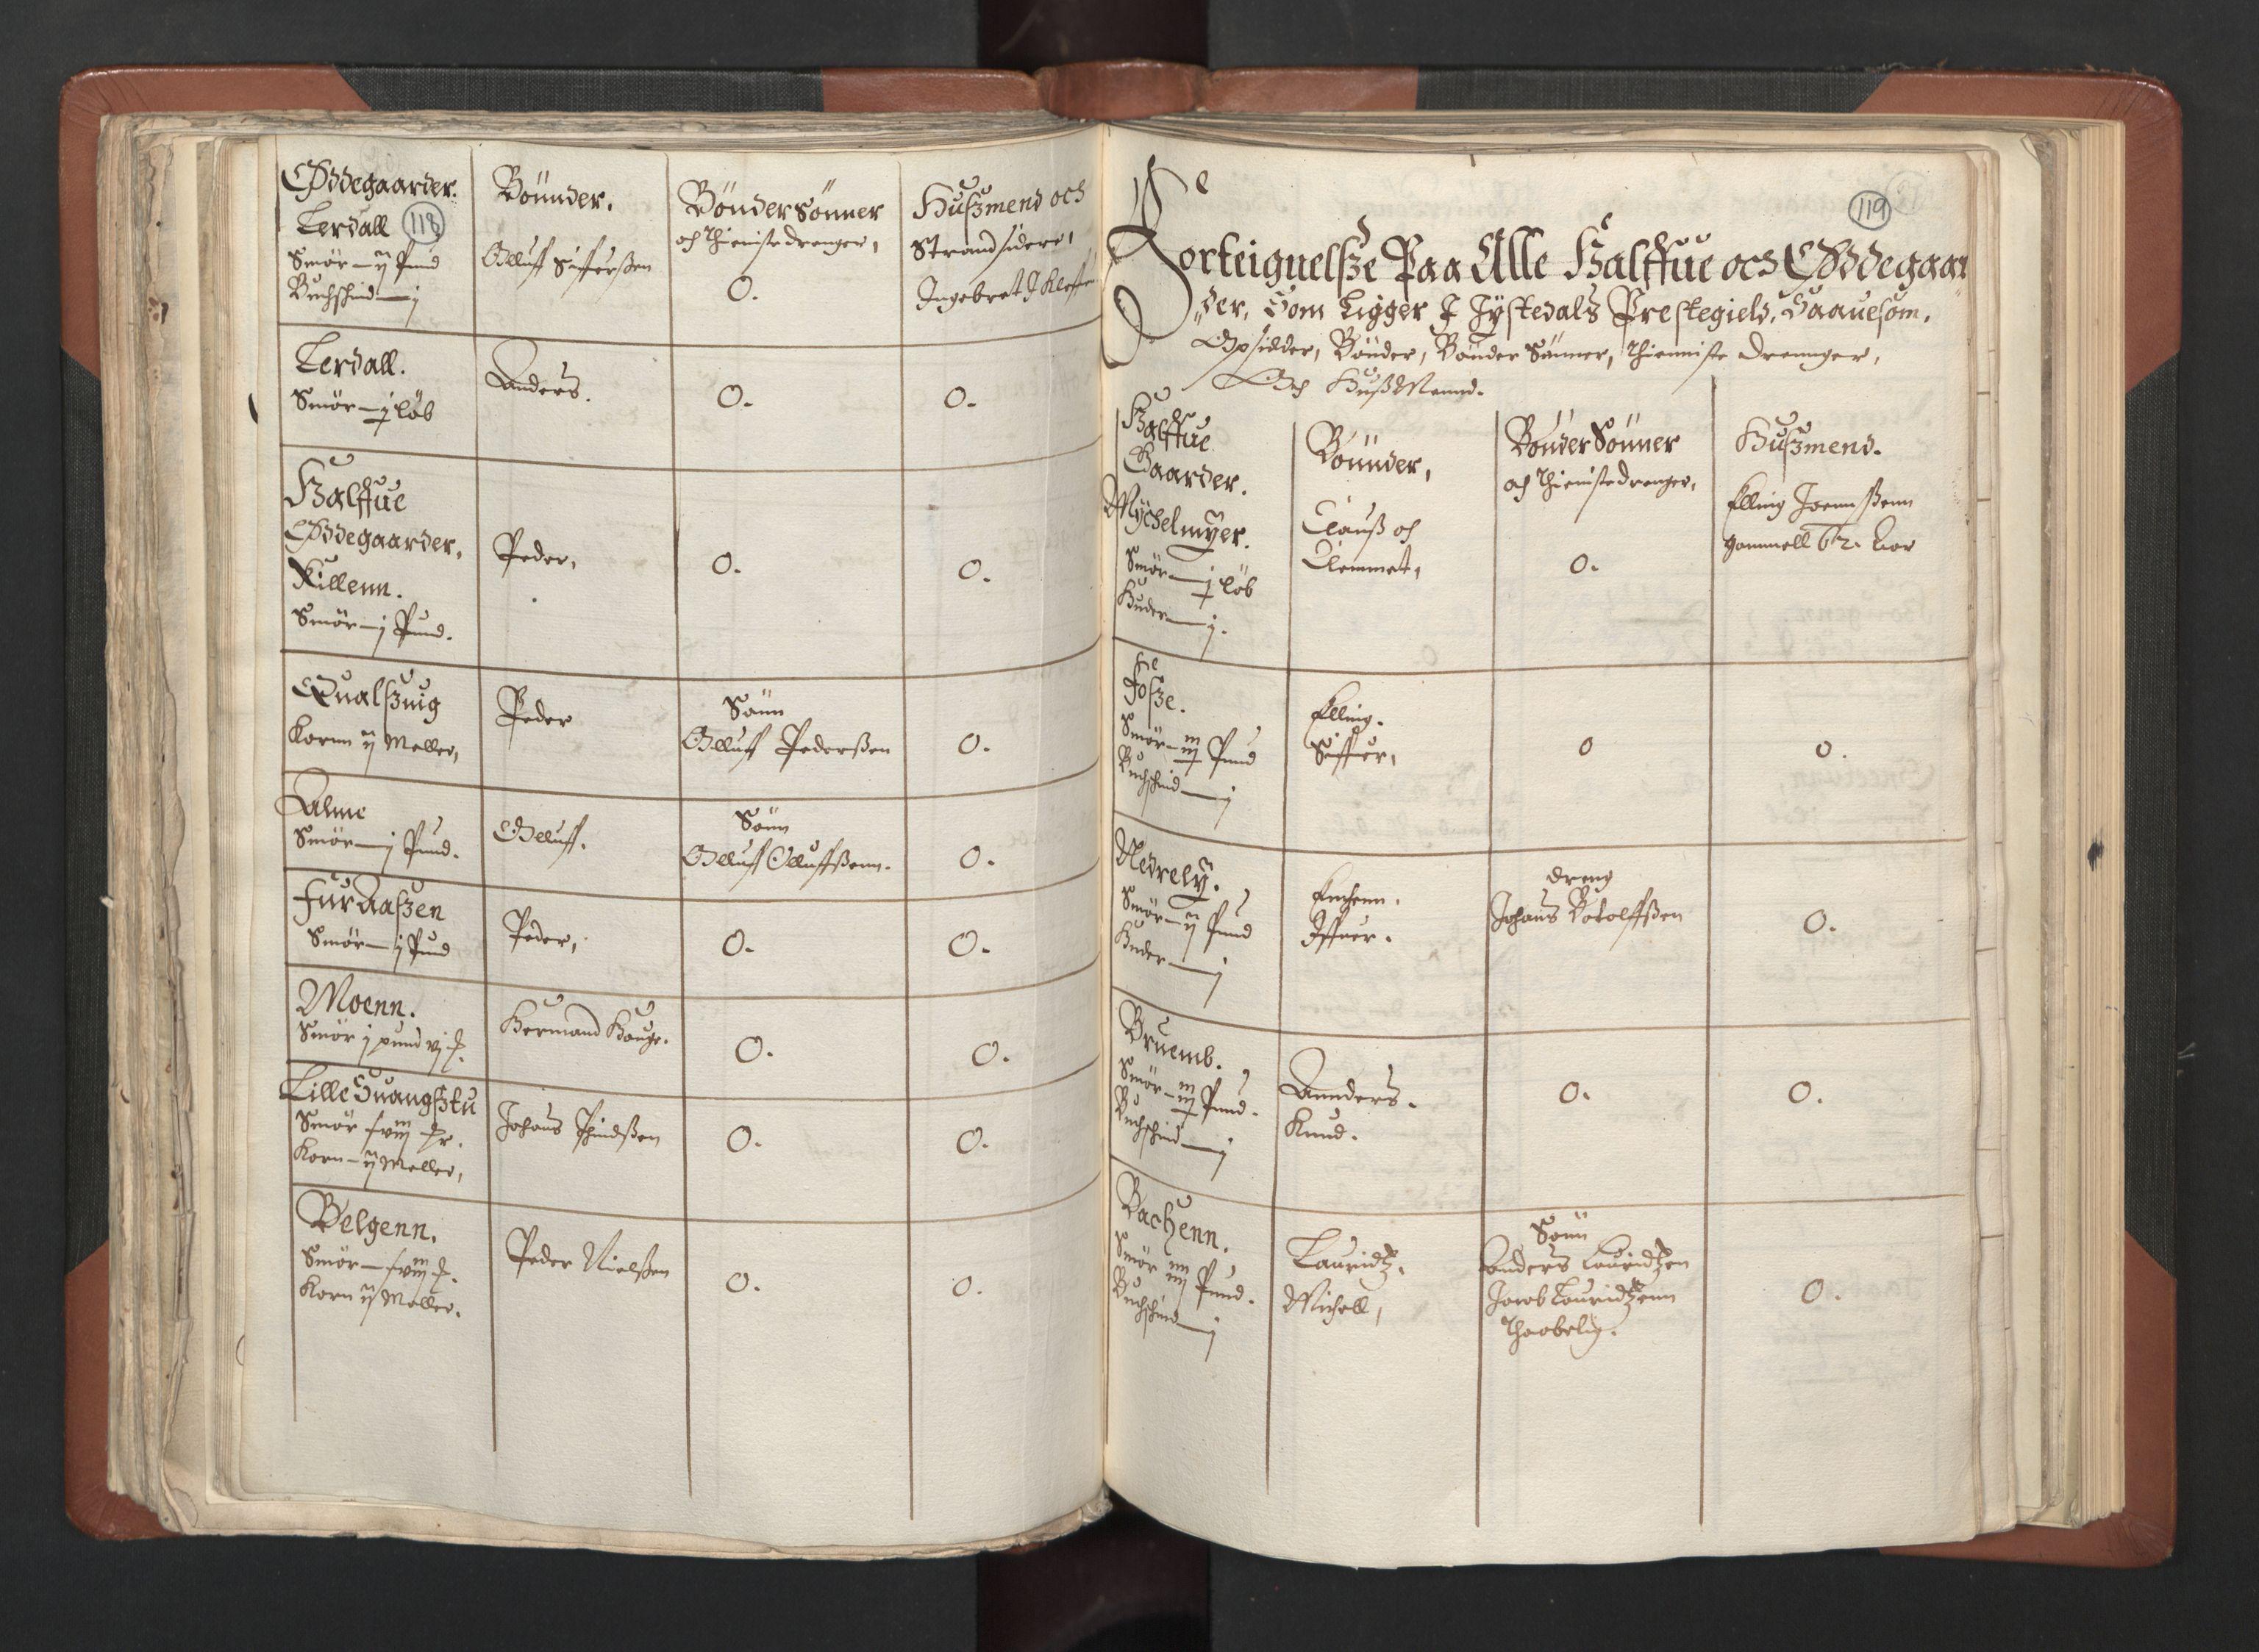 RA, Fogdenes og sorenskrivernes manntall 1664-1666, nr. 14: Hardanger len, Ytre Sogn fogderi og Indre Sogn fogderi, 1664-1665, s. 118-119